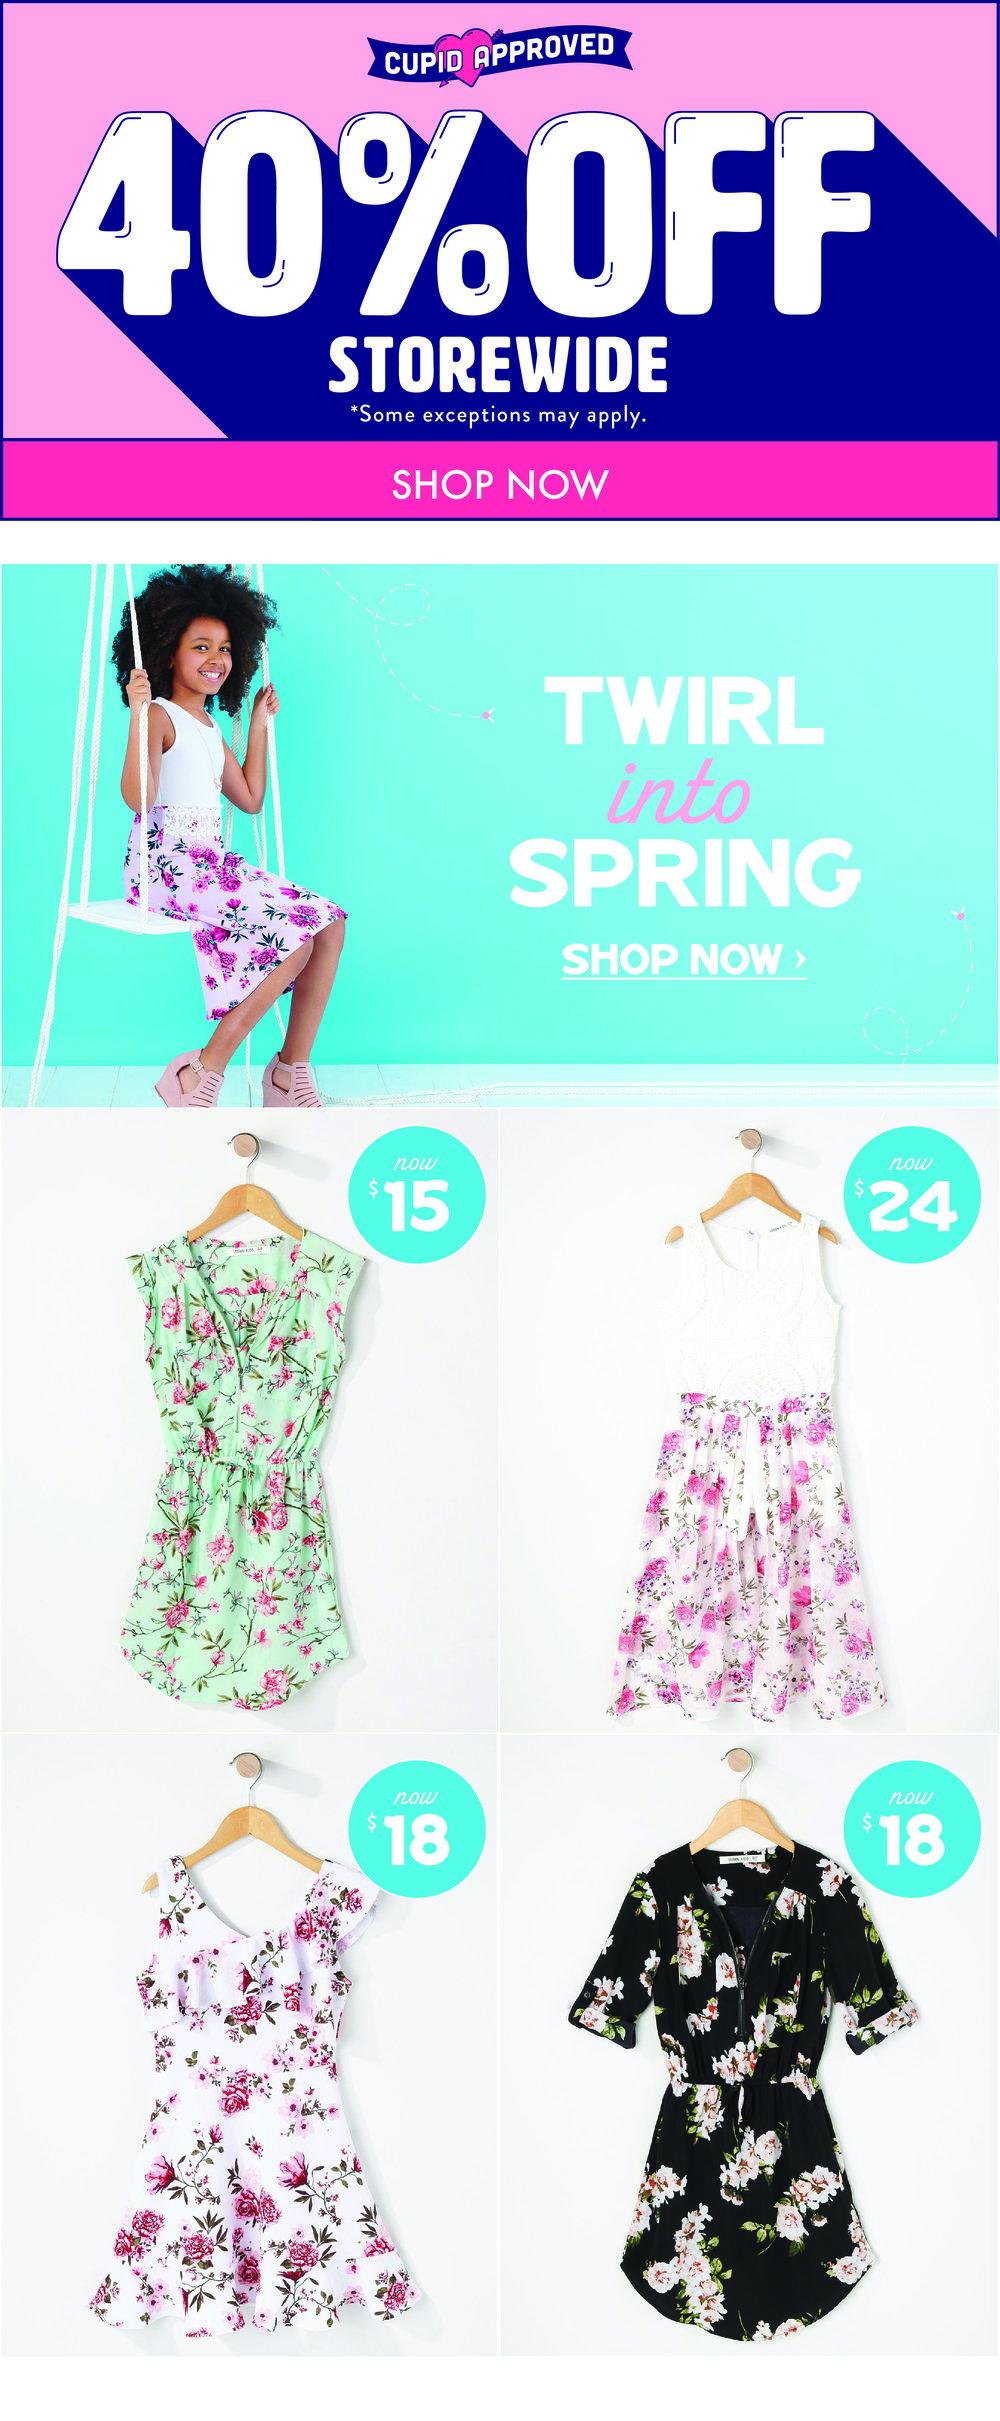 FEB11-DRESSES-LAYOUT.jpg